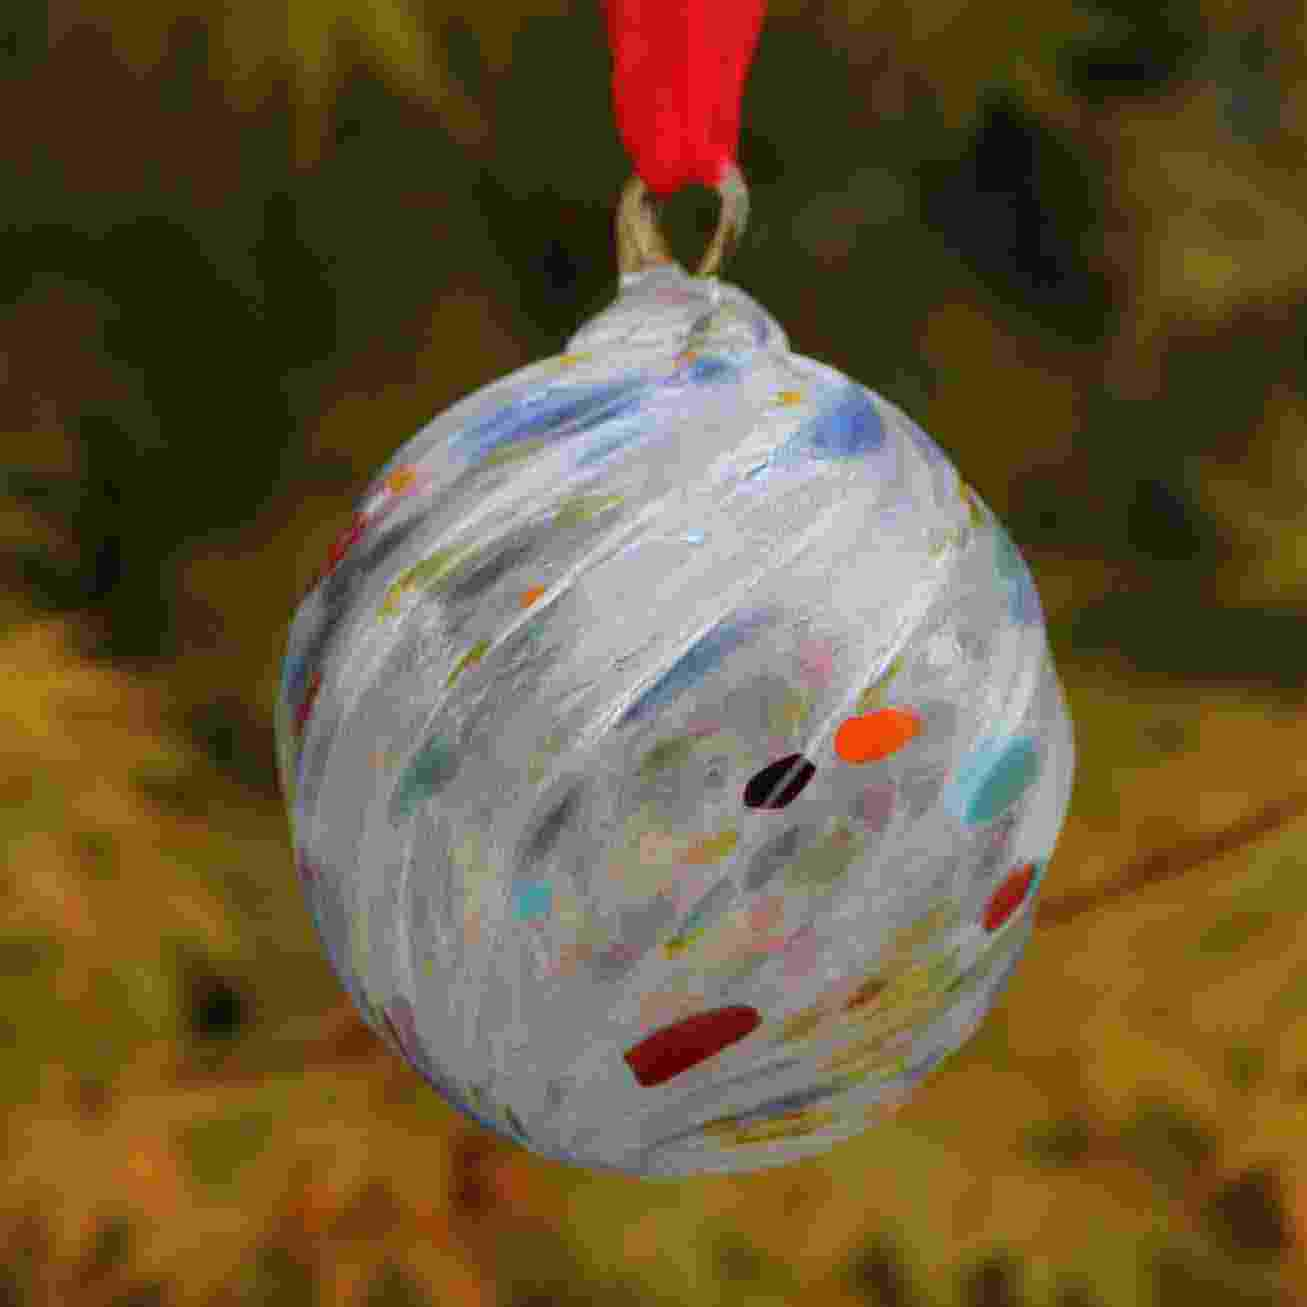 Cousin ornaments - Exclusive Hand Blown Ornaments